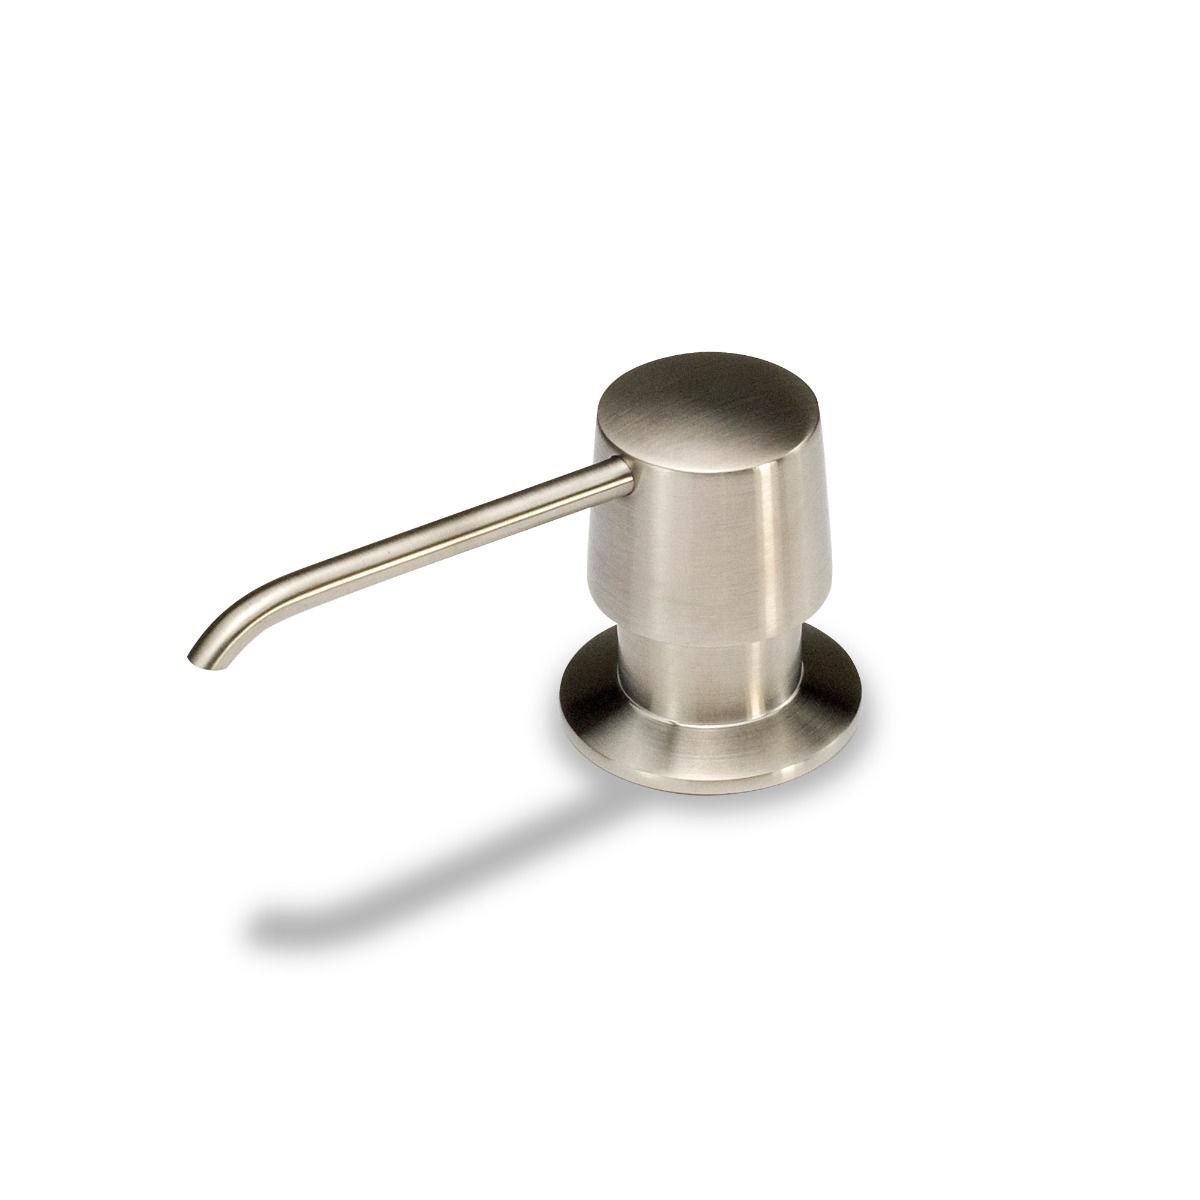 Soap dispenser for kitchen sink Photo - 2